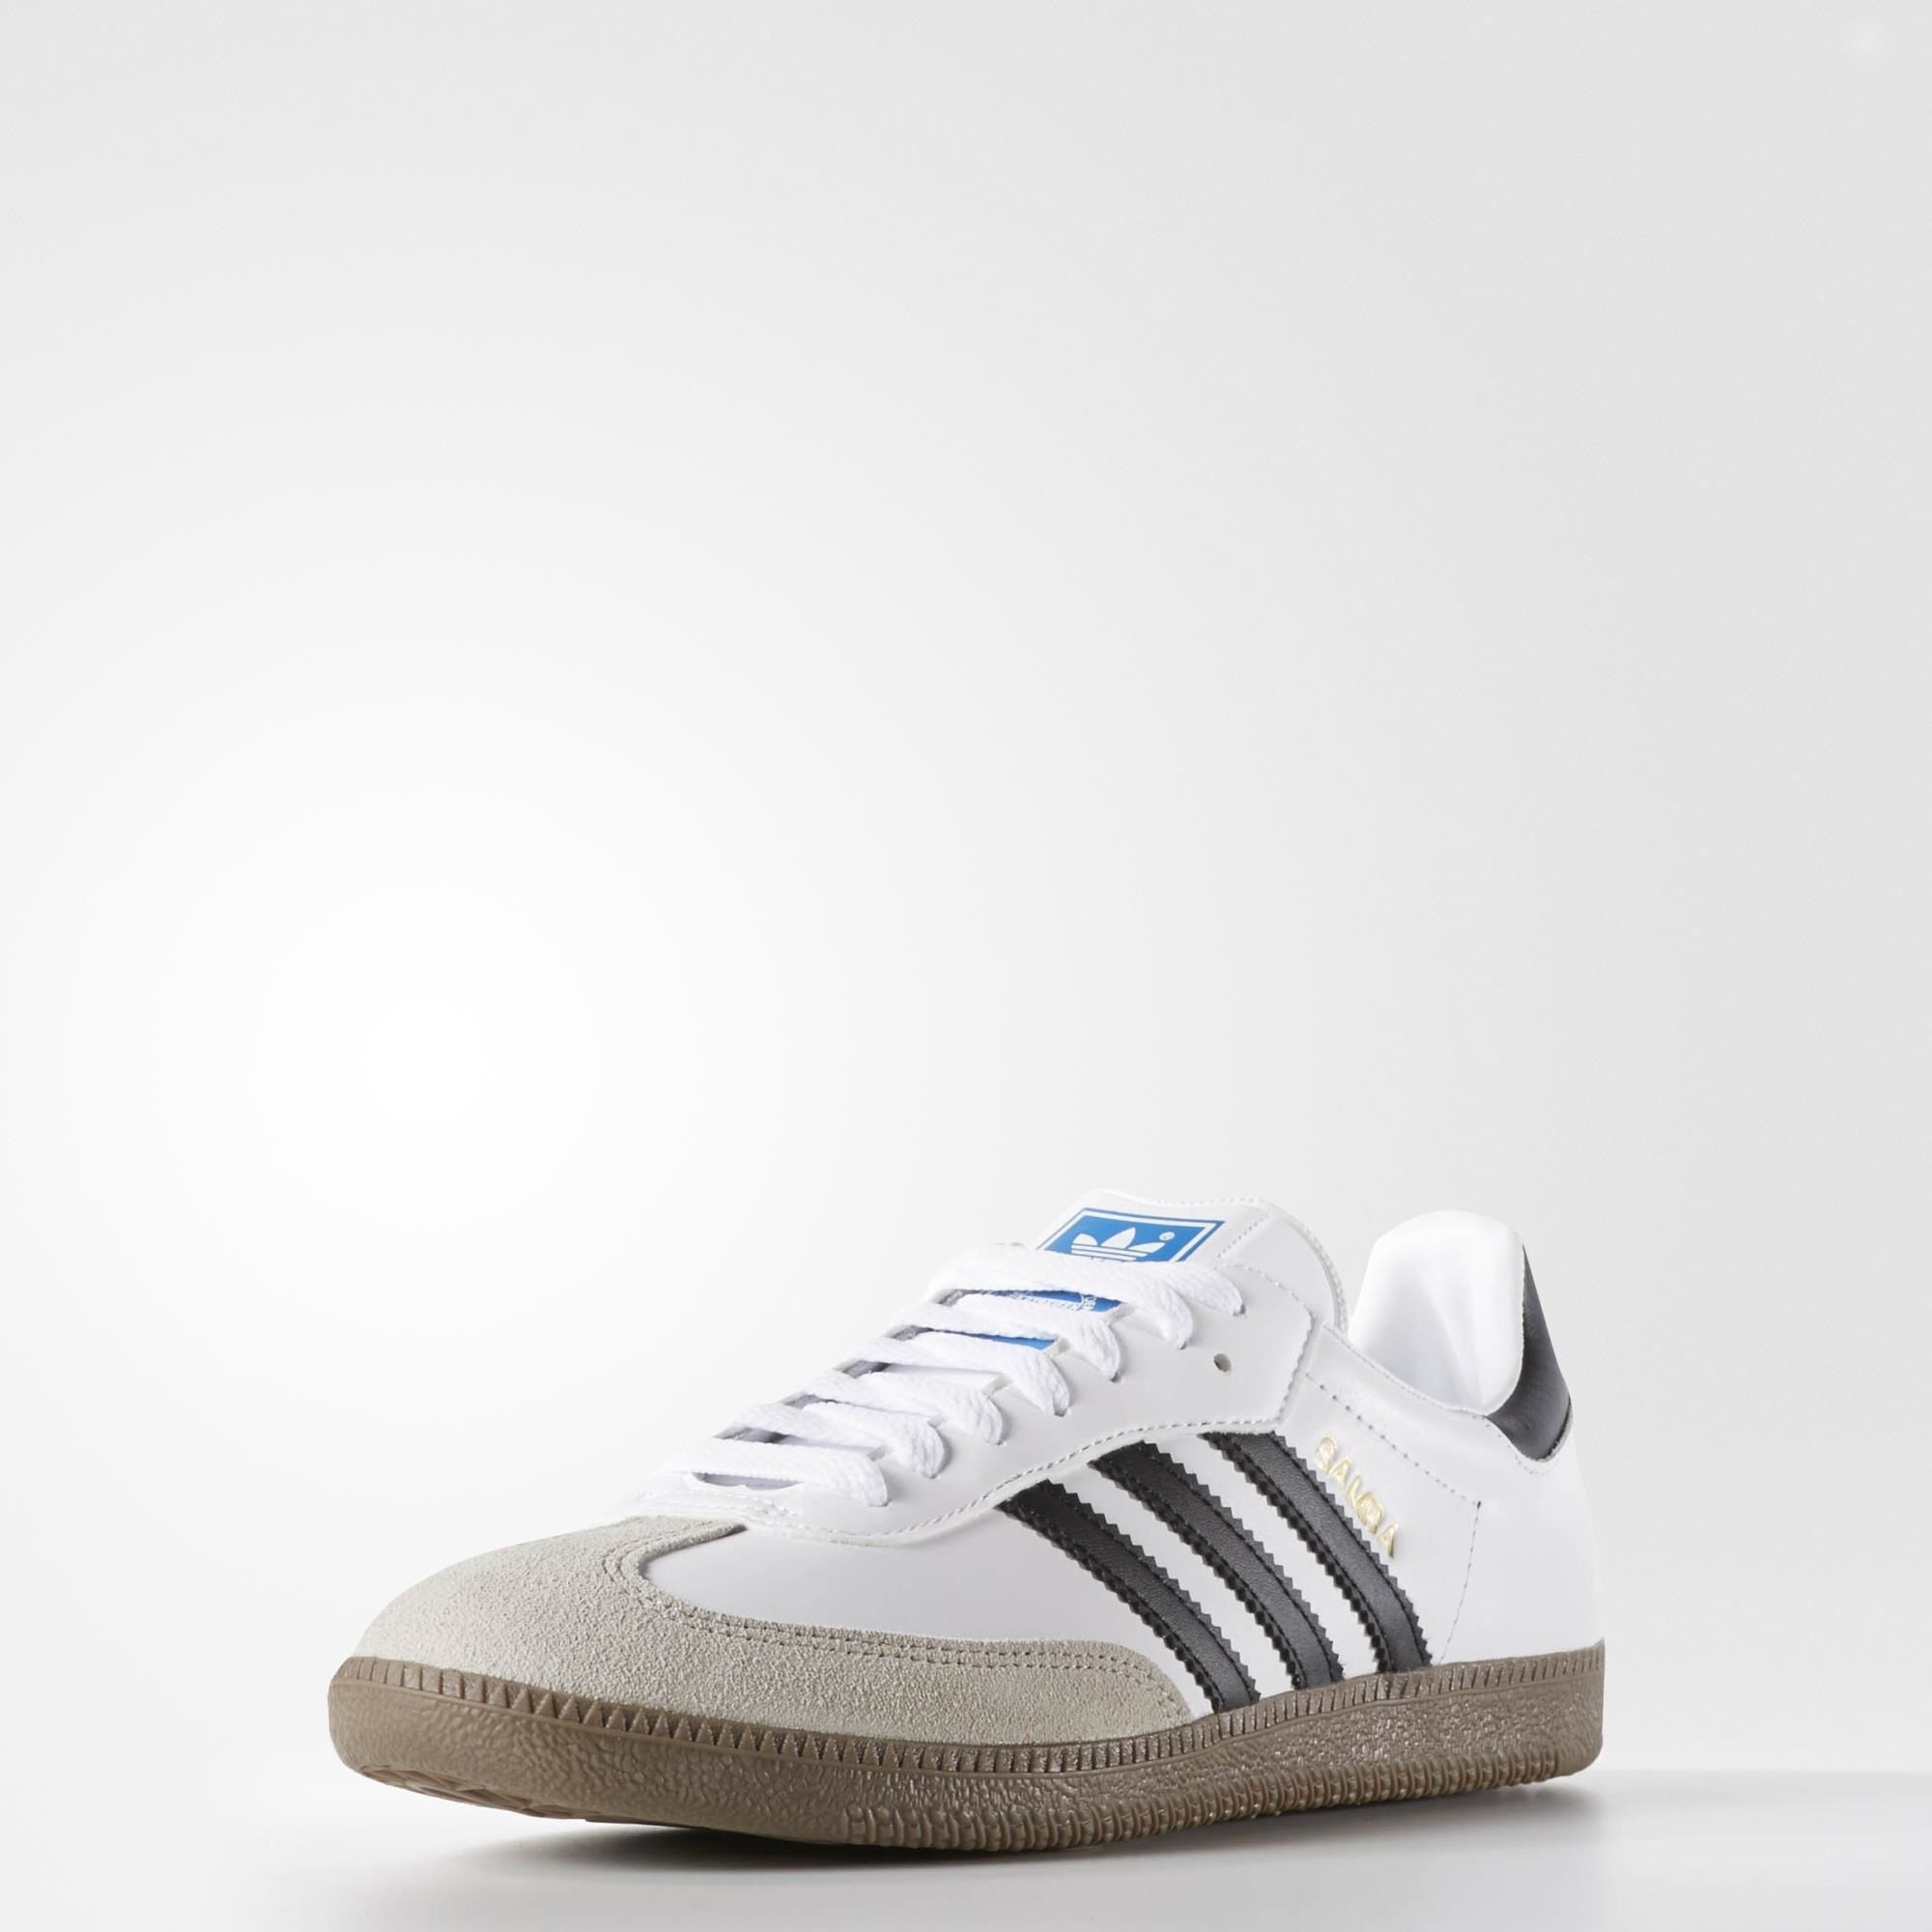 adidas samba scarpe bianche adidas noi scarpe pinterest adidas